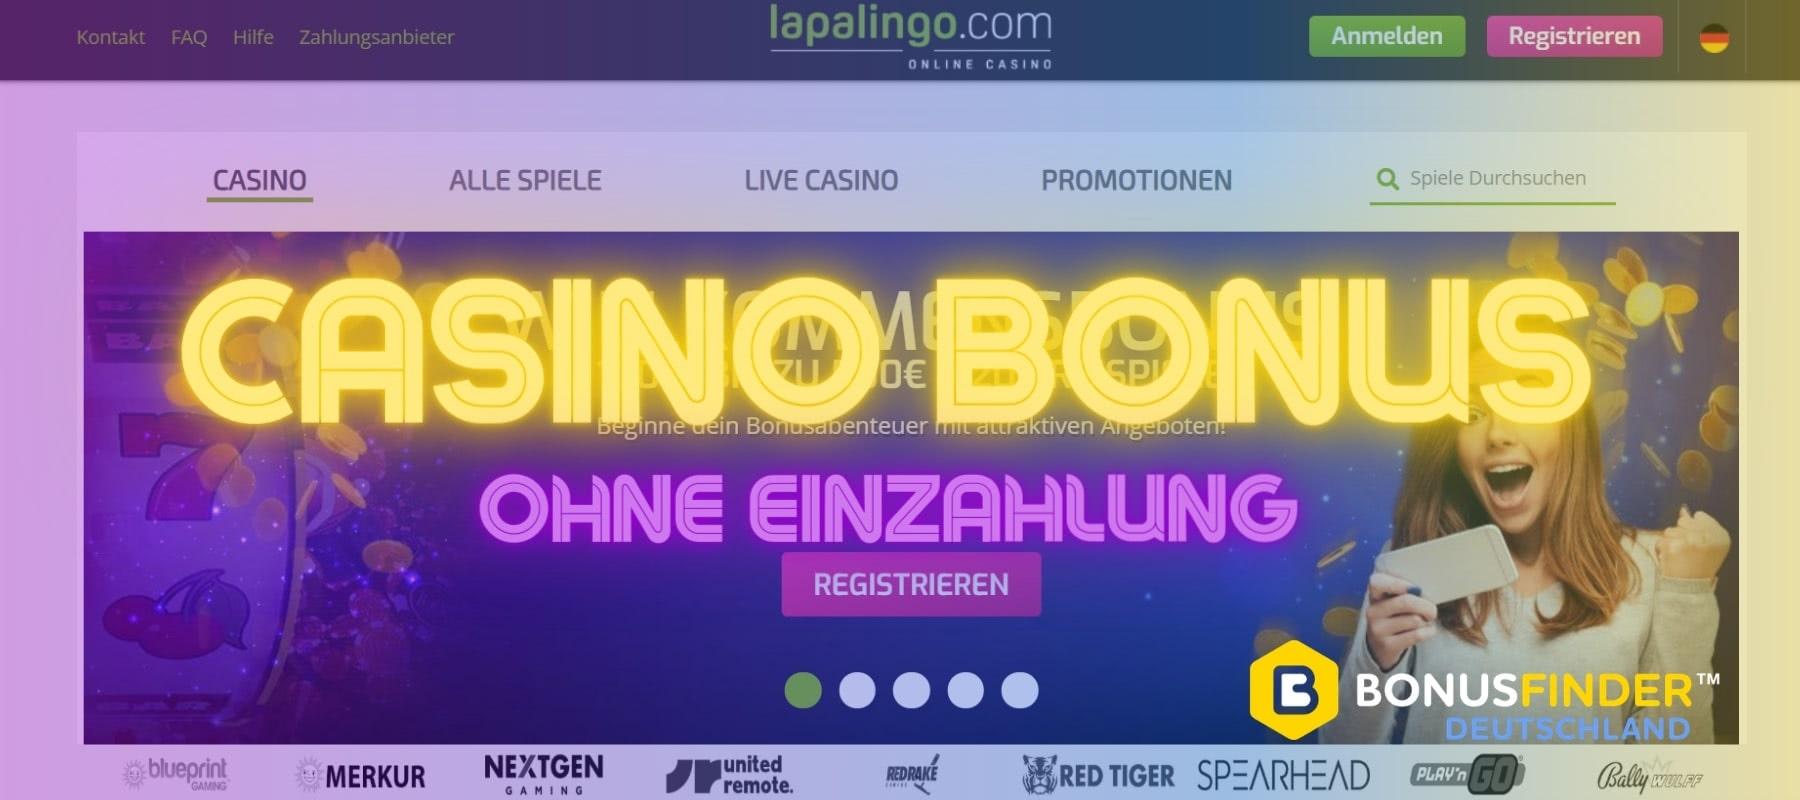 lapalingo casino bonus ohne einzahlung